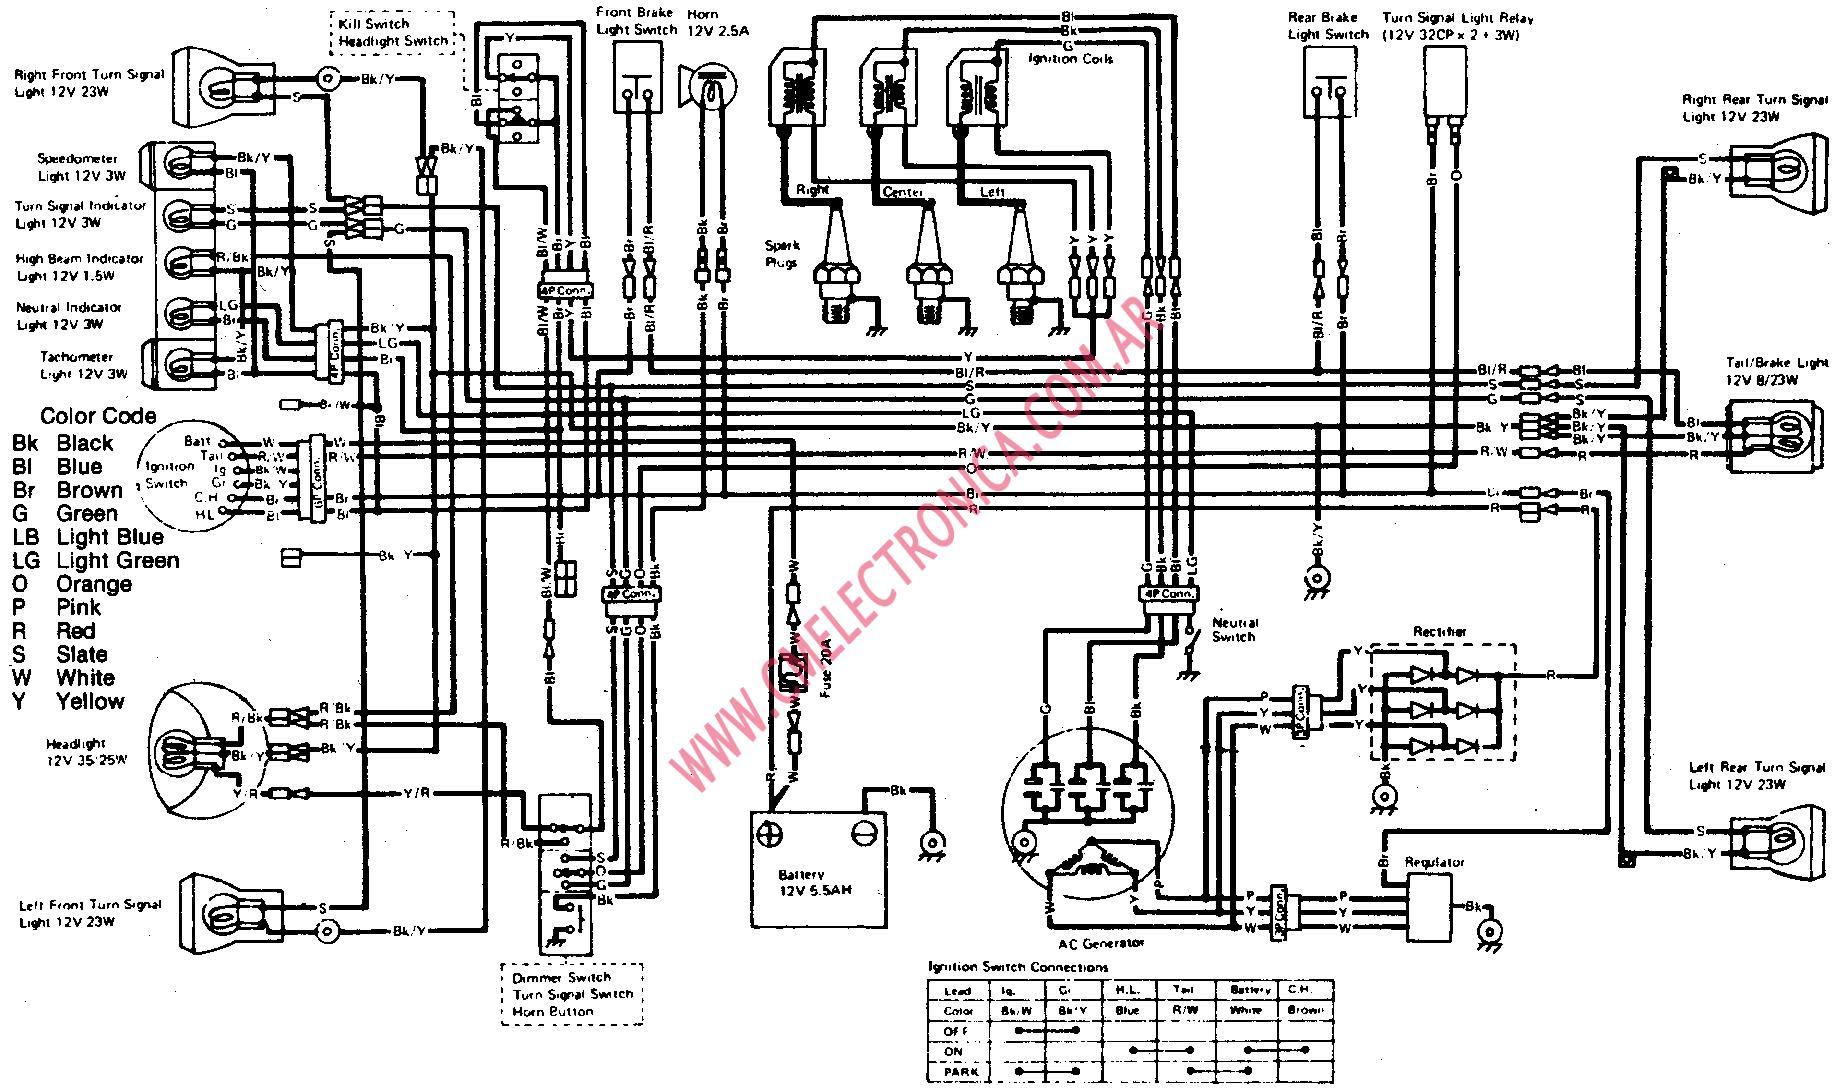 diagram] stater wiring diagram kawasaki bayou full version hd quality  kawasaki bayou - diagramzhangs.anisitalia.it  anisitalia.it